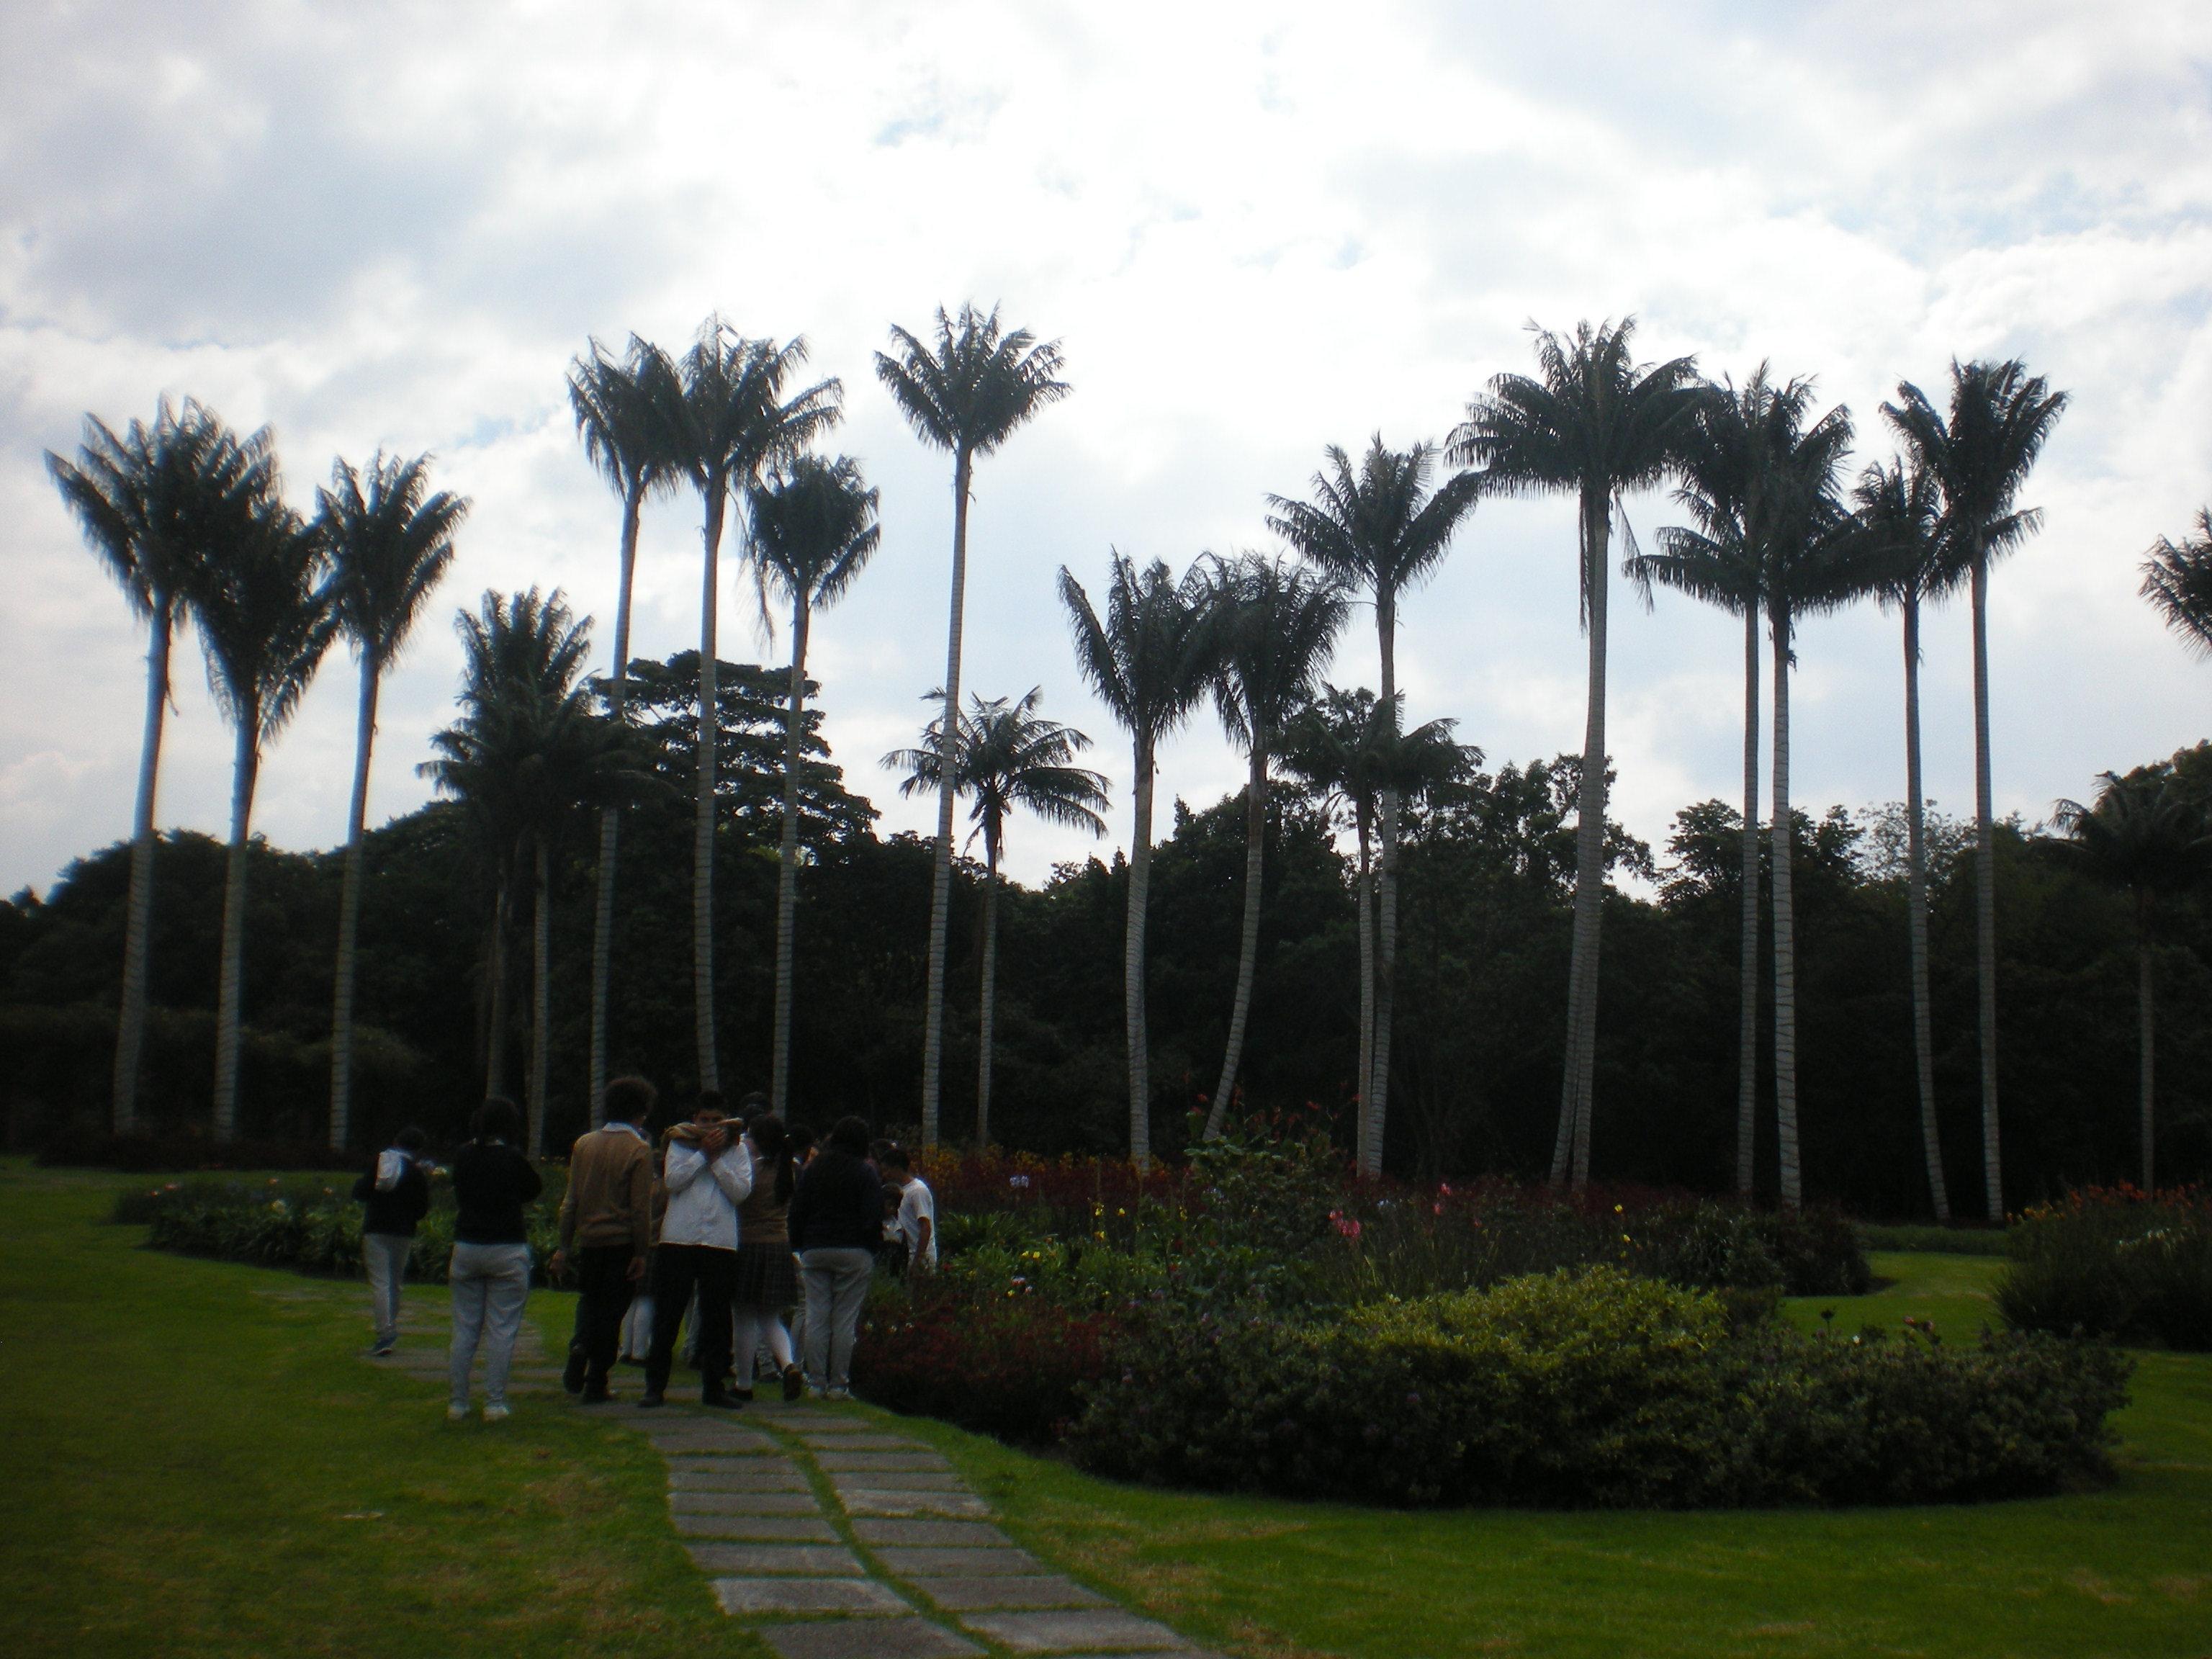 Marco tulio fernandez salida al jard n bot nico jcm for Jardin botanico cursos